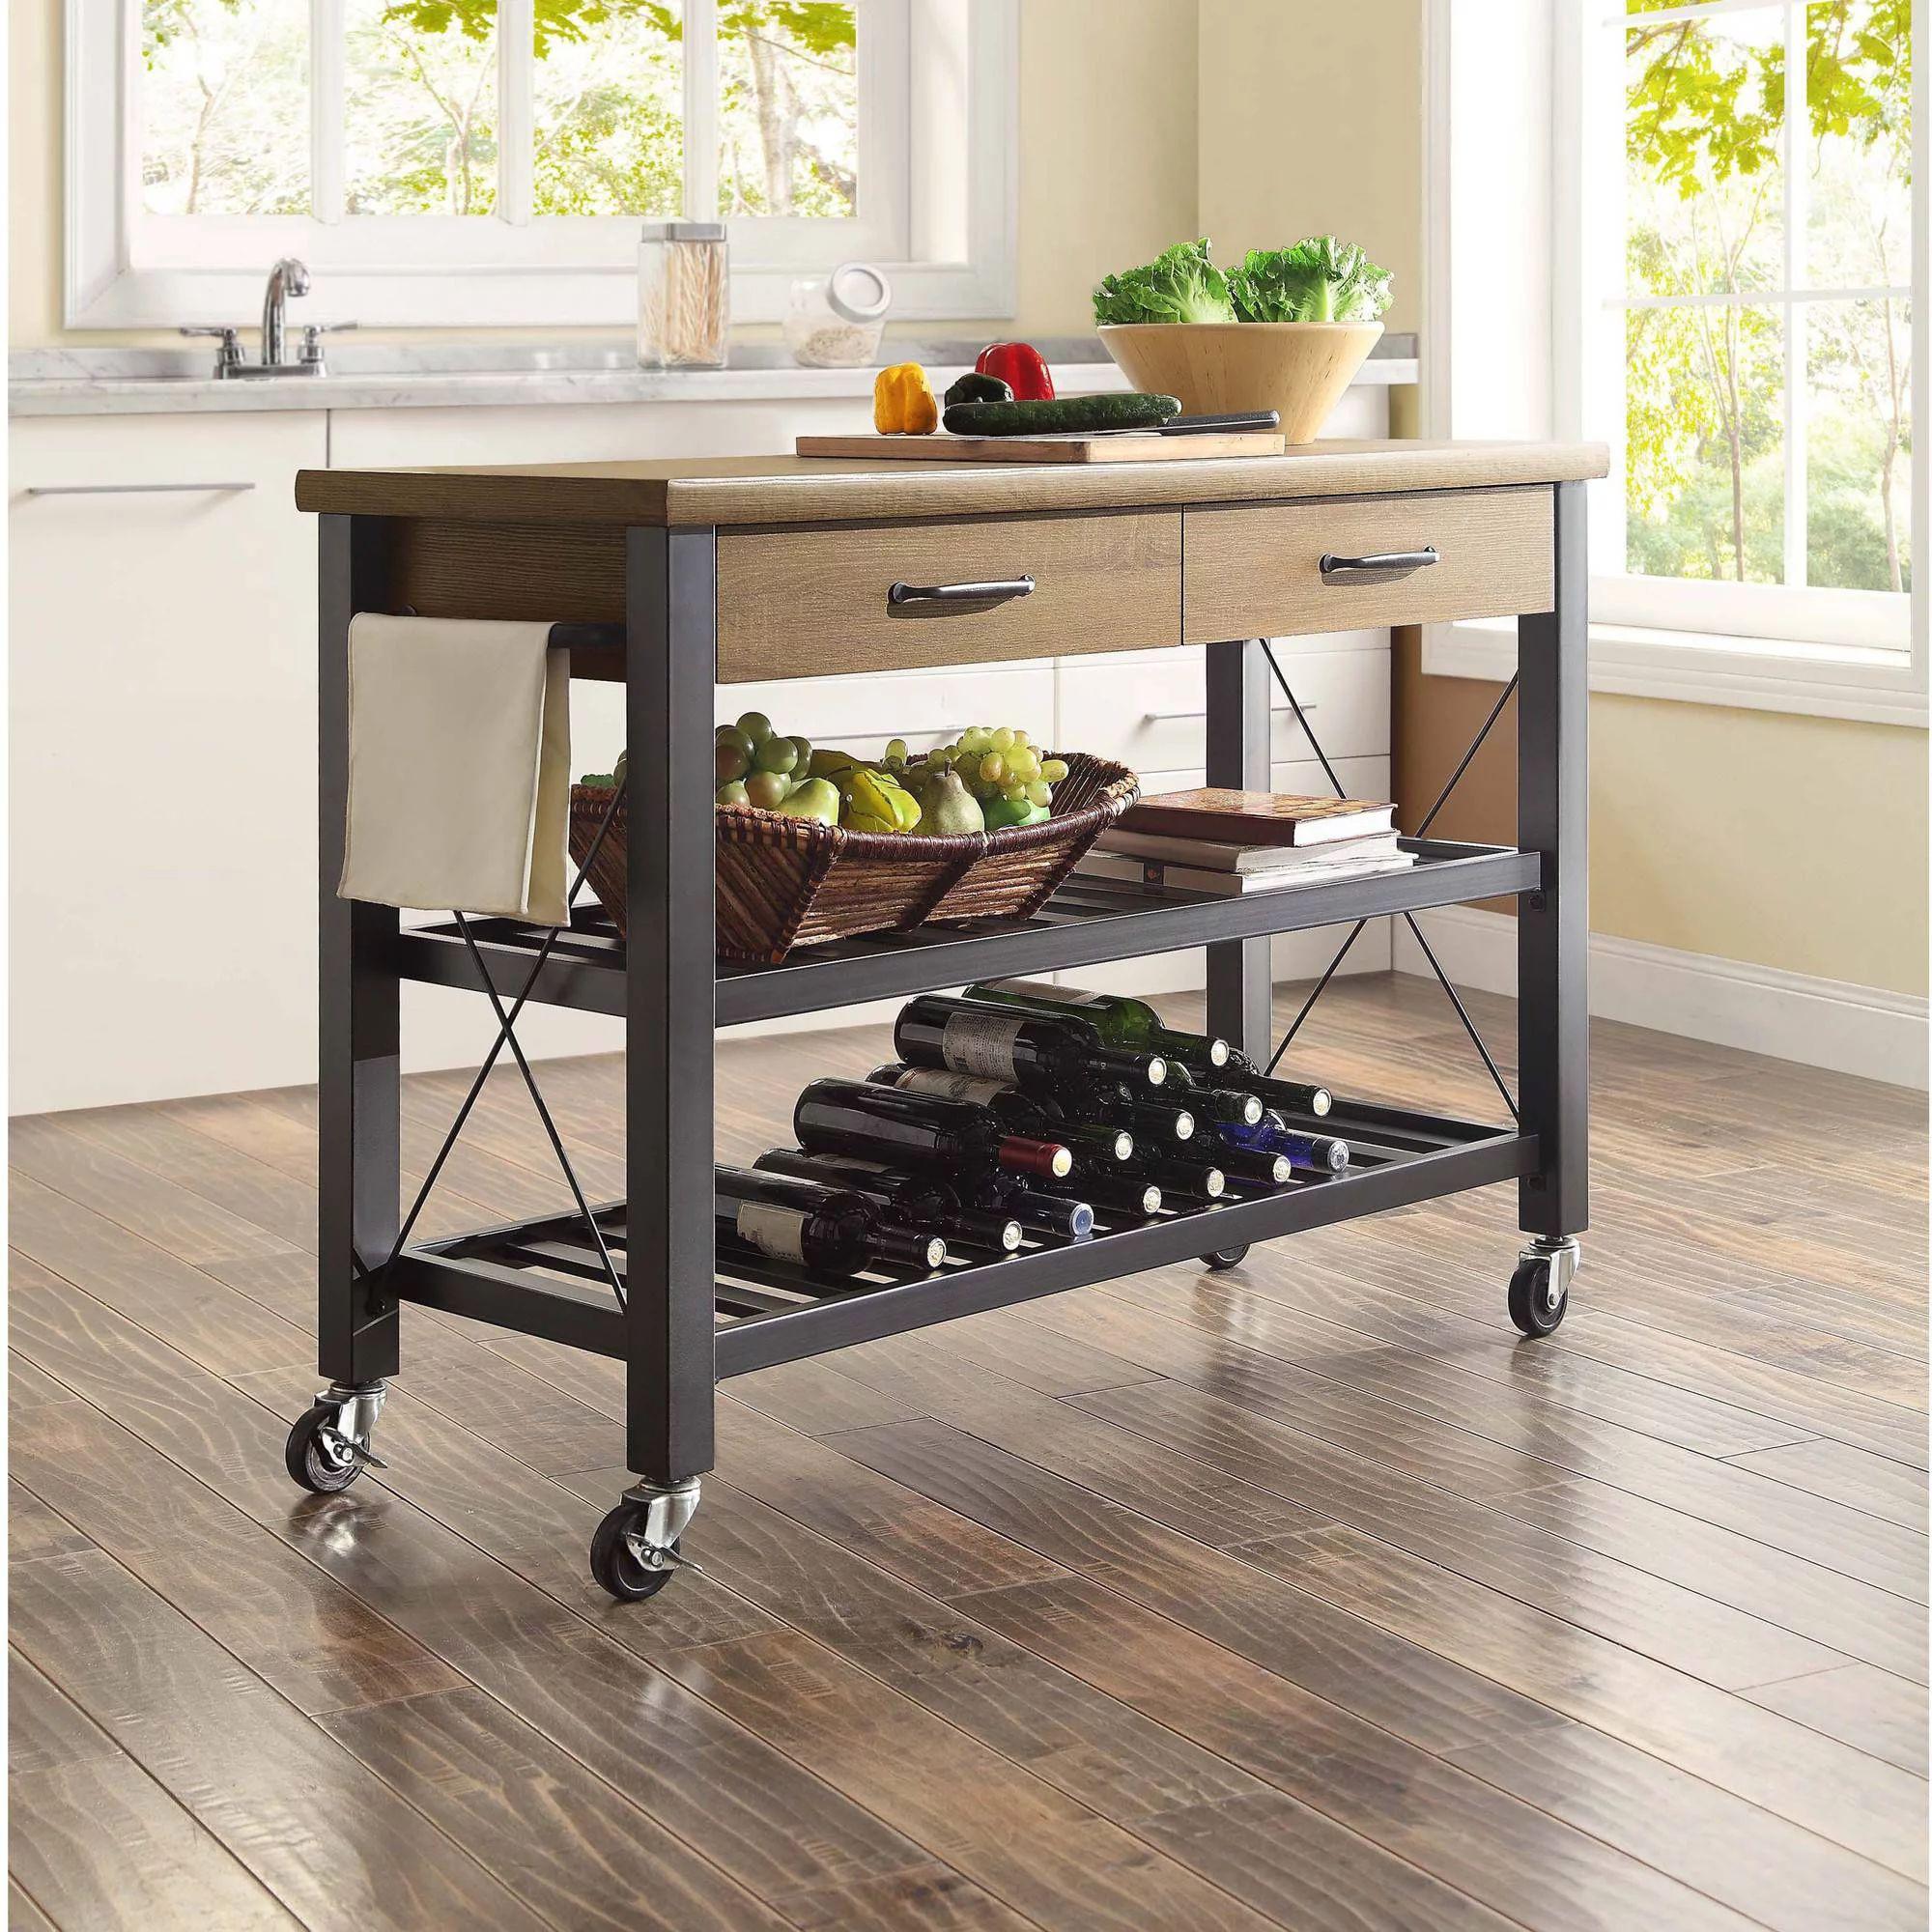 Whalen santa fe rolling kitchen cart with metal shelves rustic brown walmart com